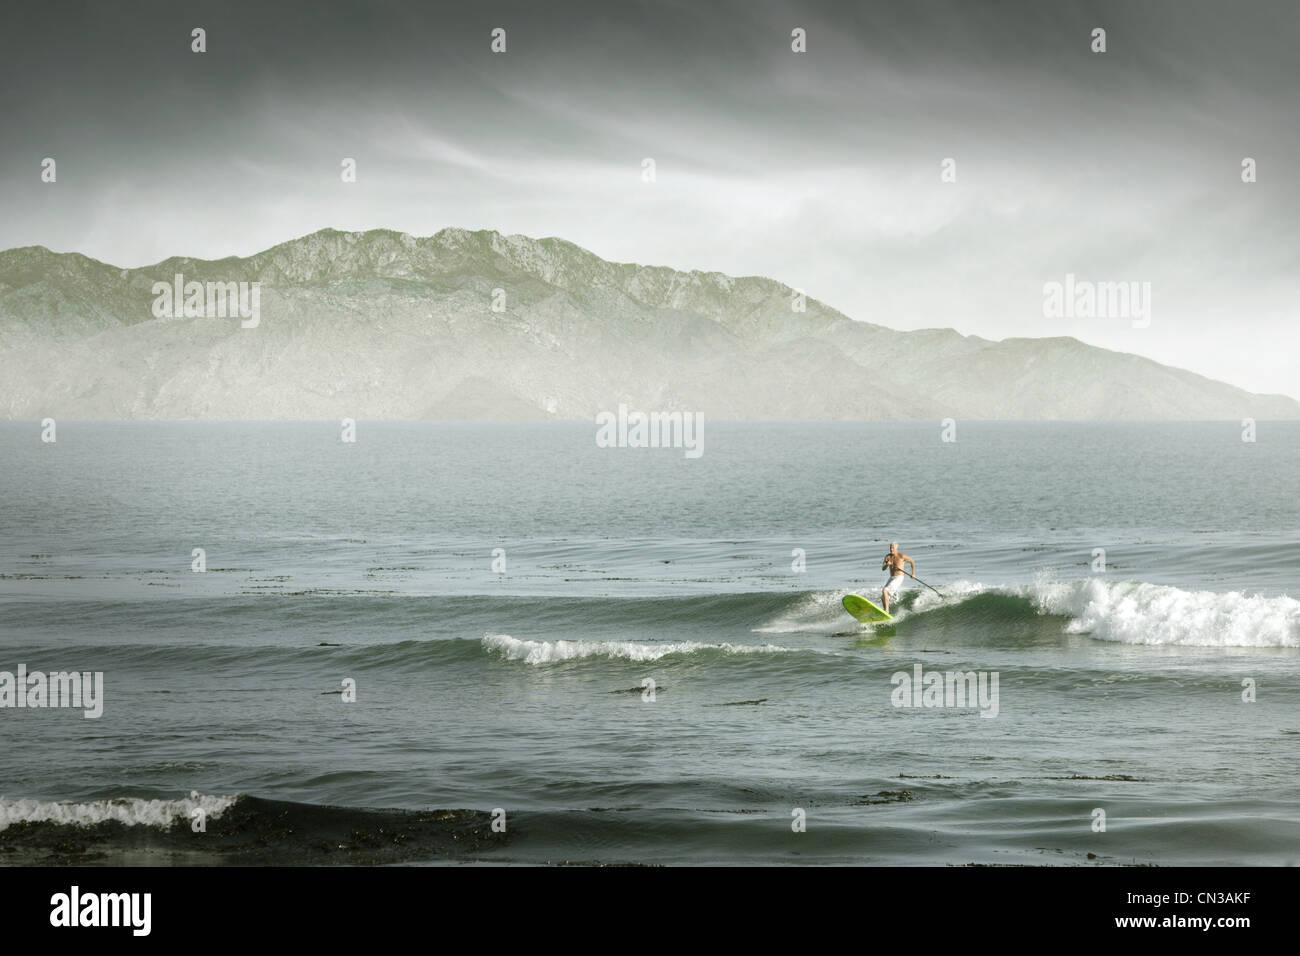 Man surfing, Santa Cruz, California, USA - Stock Image